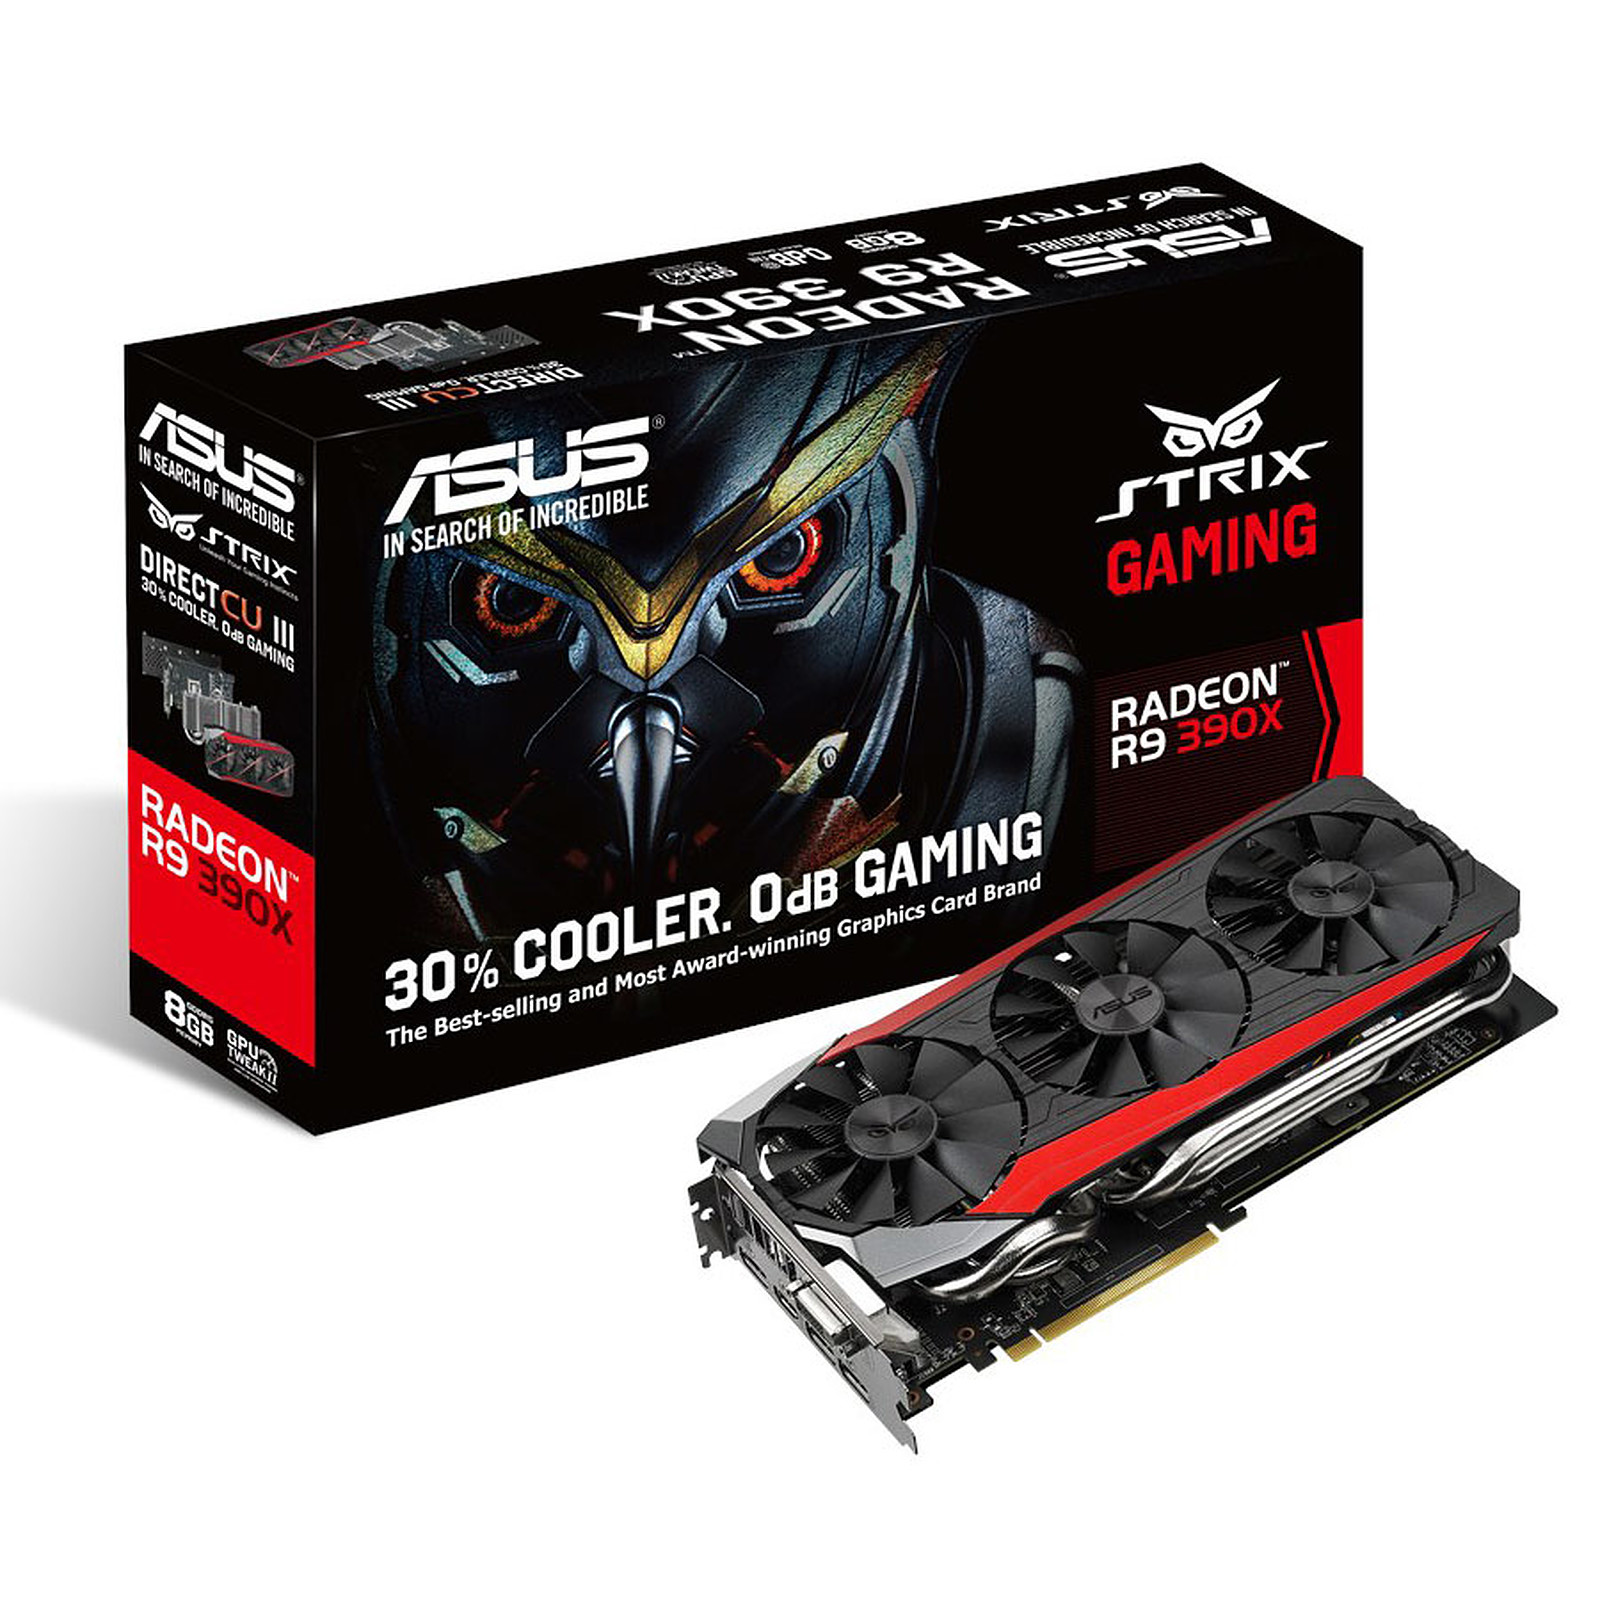 ASUS Radeon R9 390X STRIX-R9390X-DC3-8GD5-GAMING